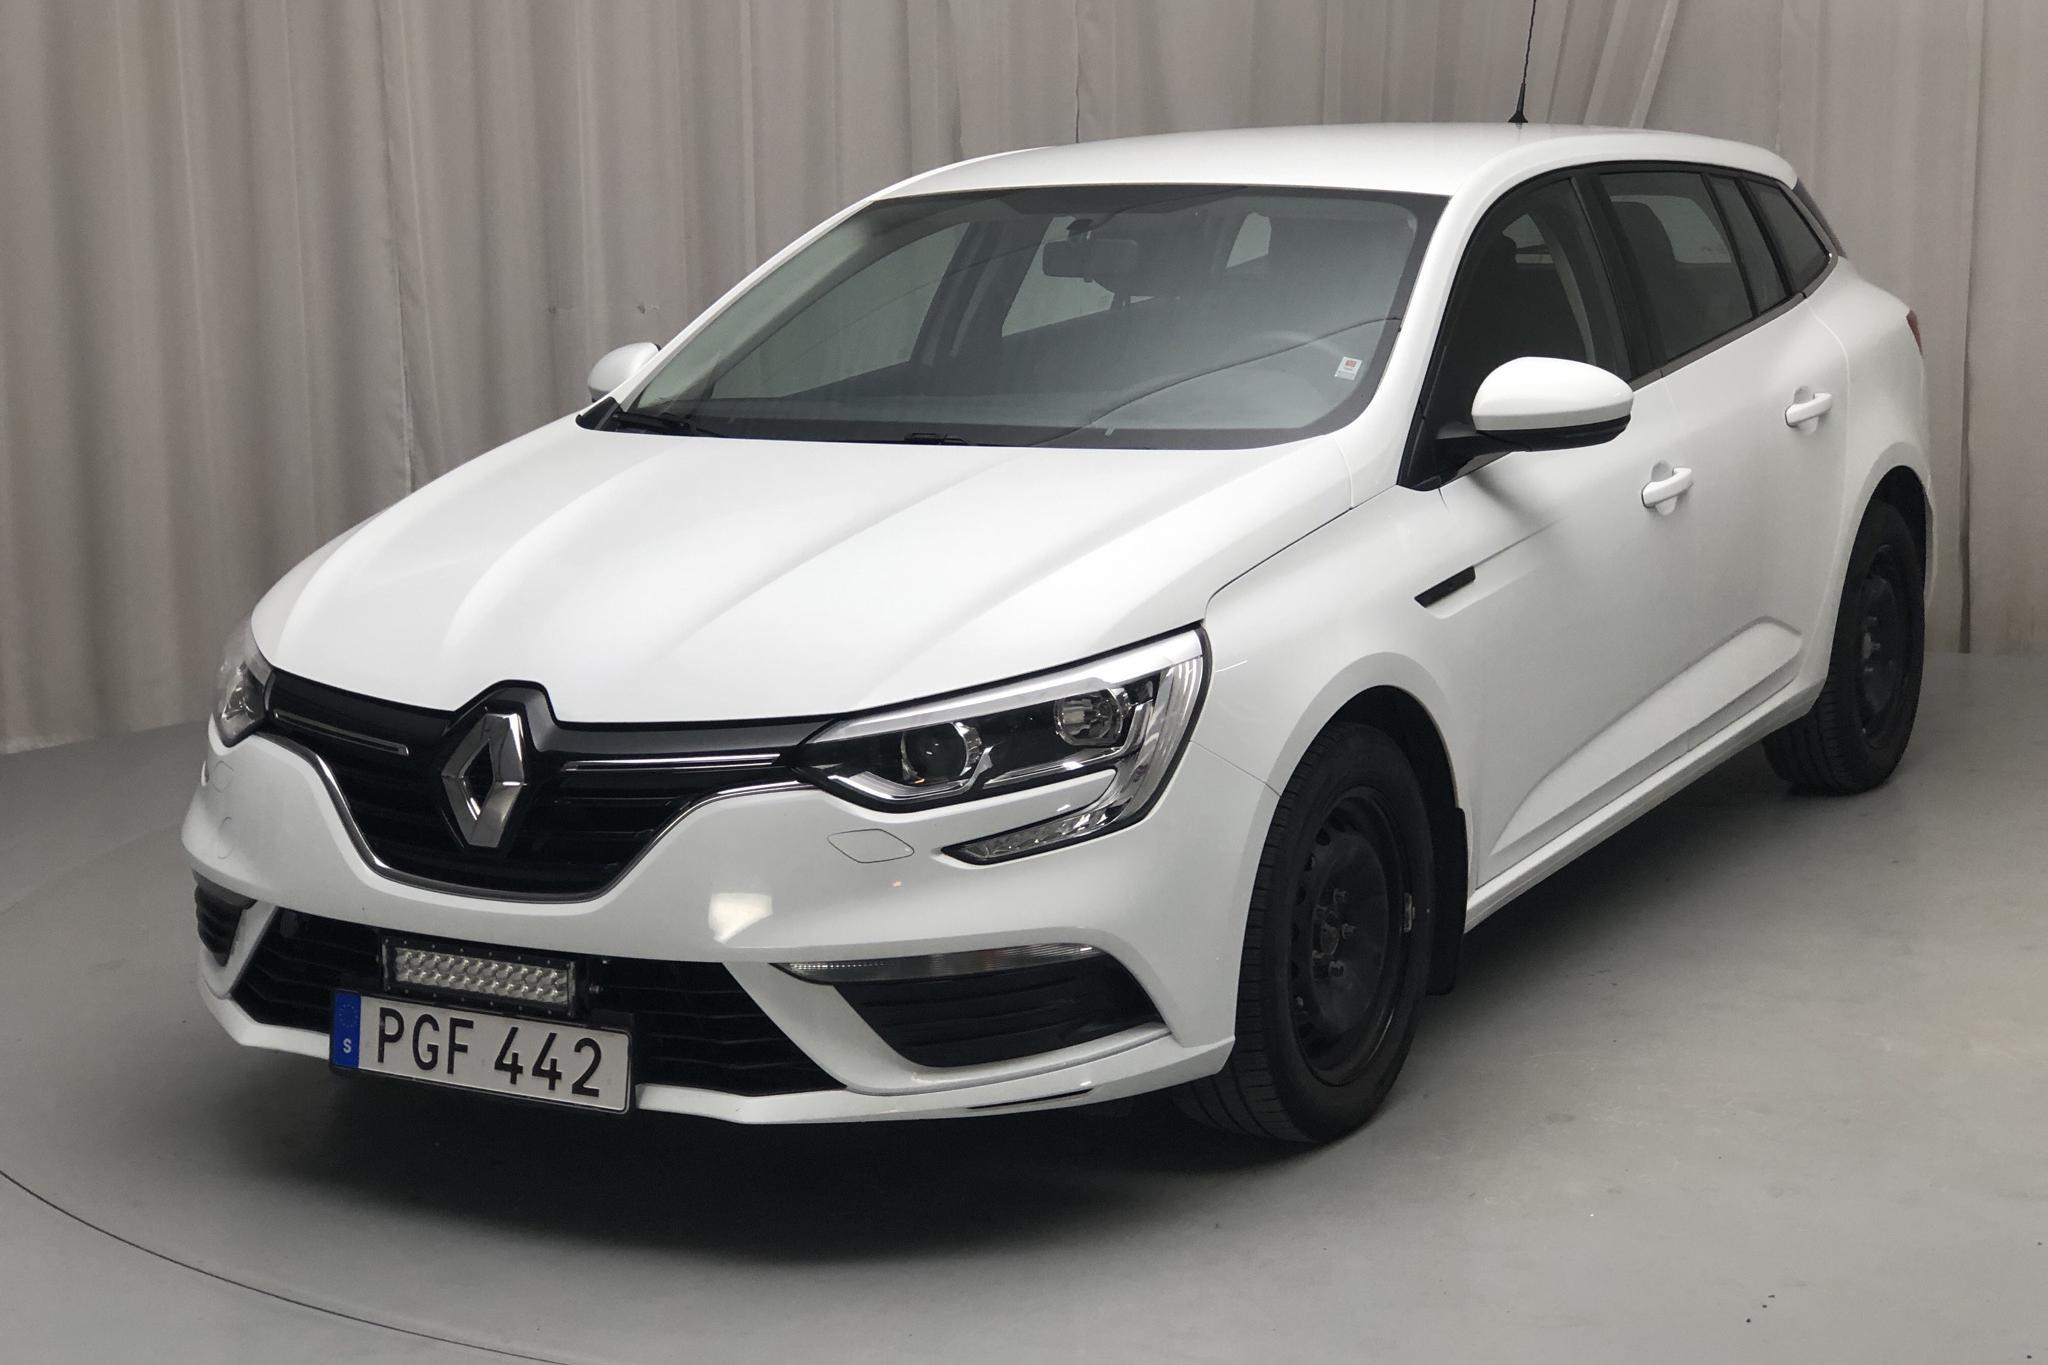 Renault Mégane 1.5 dCi Sport Tourer (110hk) - 11 585 mil - Manuell - vit - 2017